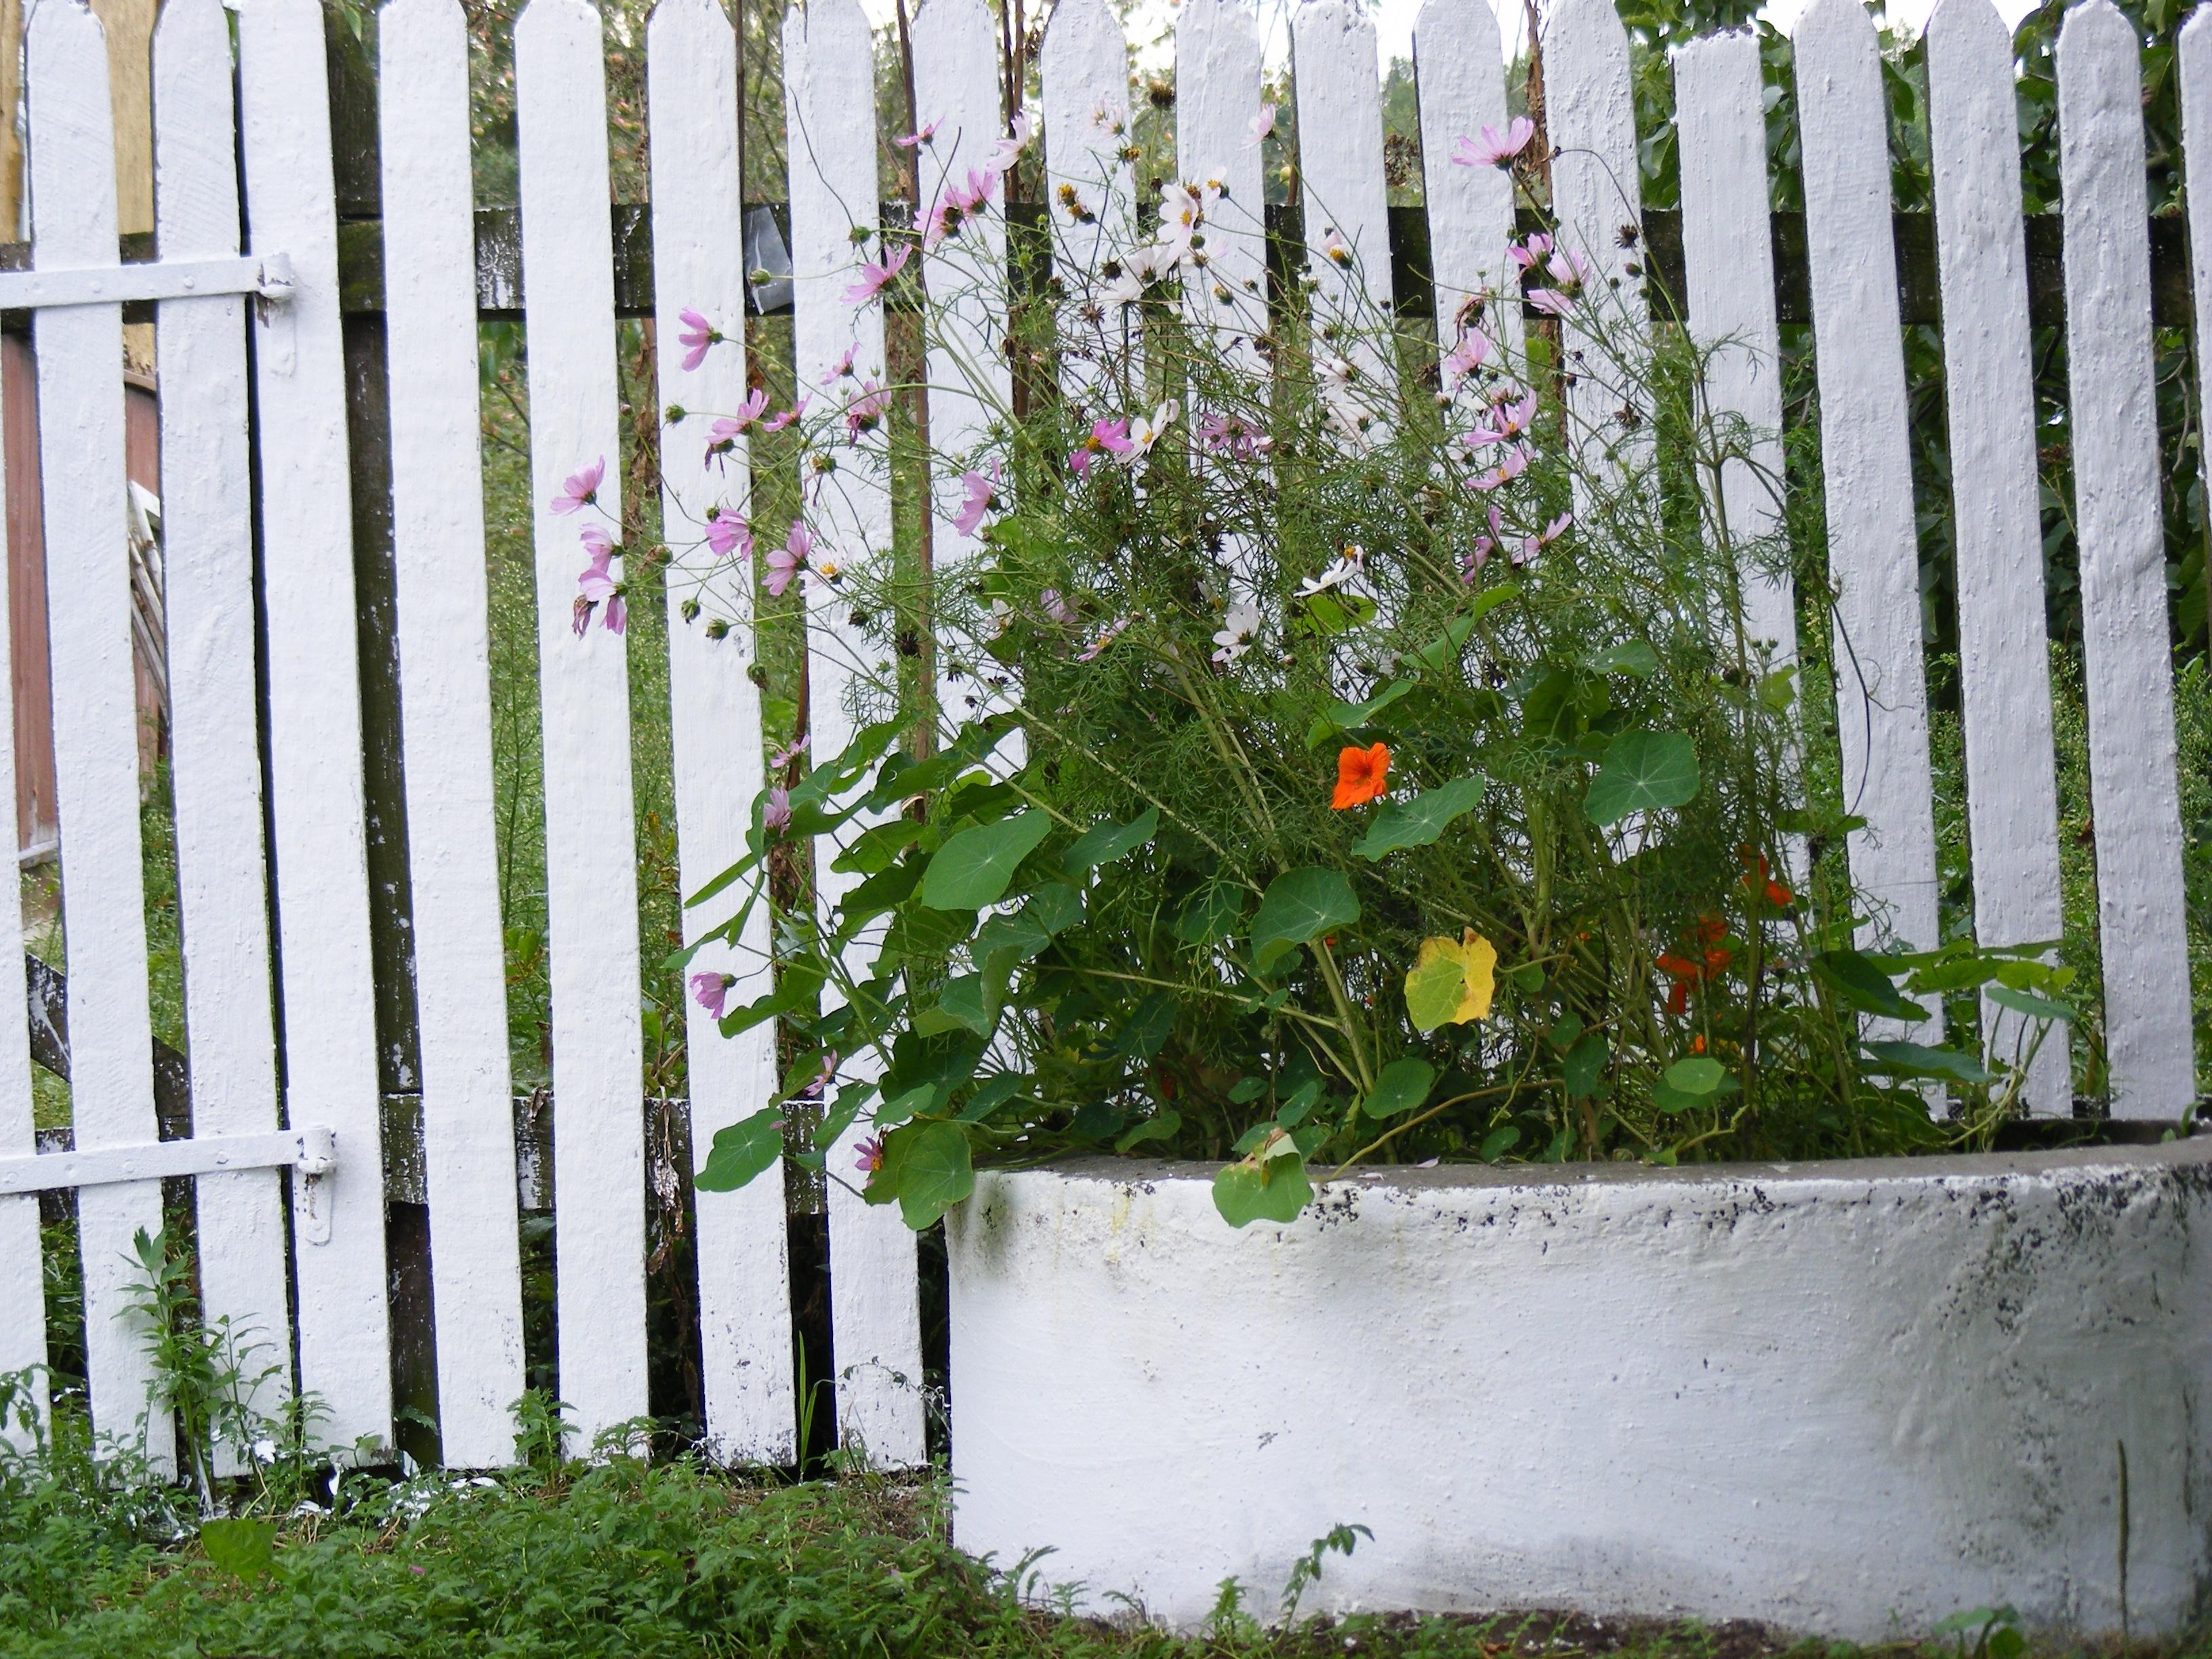 Gambar Pohon Menanam Putih Halaman Rumput Bunga Dinding Hijau Birch Alam Halaman Belakang Botani Taman Pagar Kayu Flora Beton Lingkaran Bunga Bunga Belukar Iklim Dilukis Polandia Rumah Negara Tanaman Berbunga Kayu Tanaman